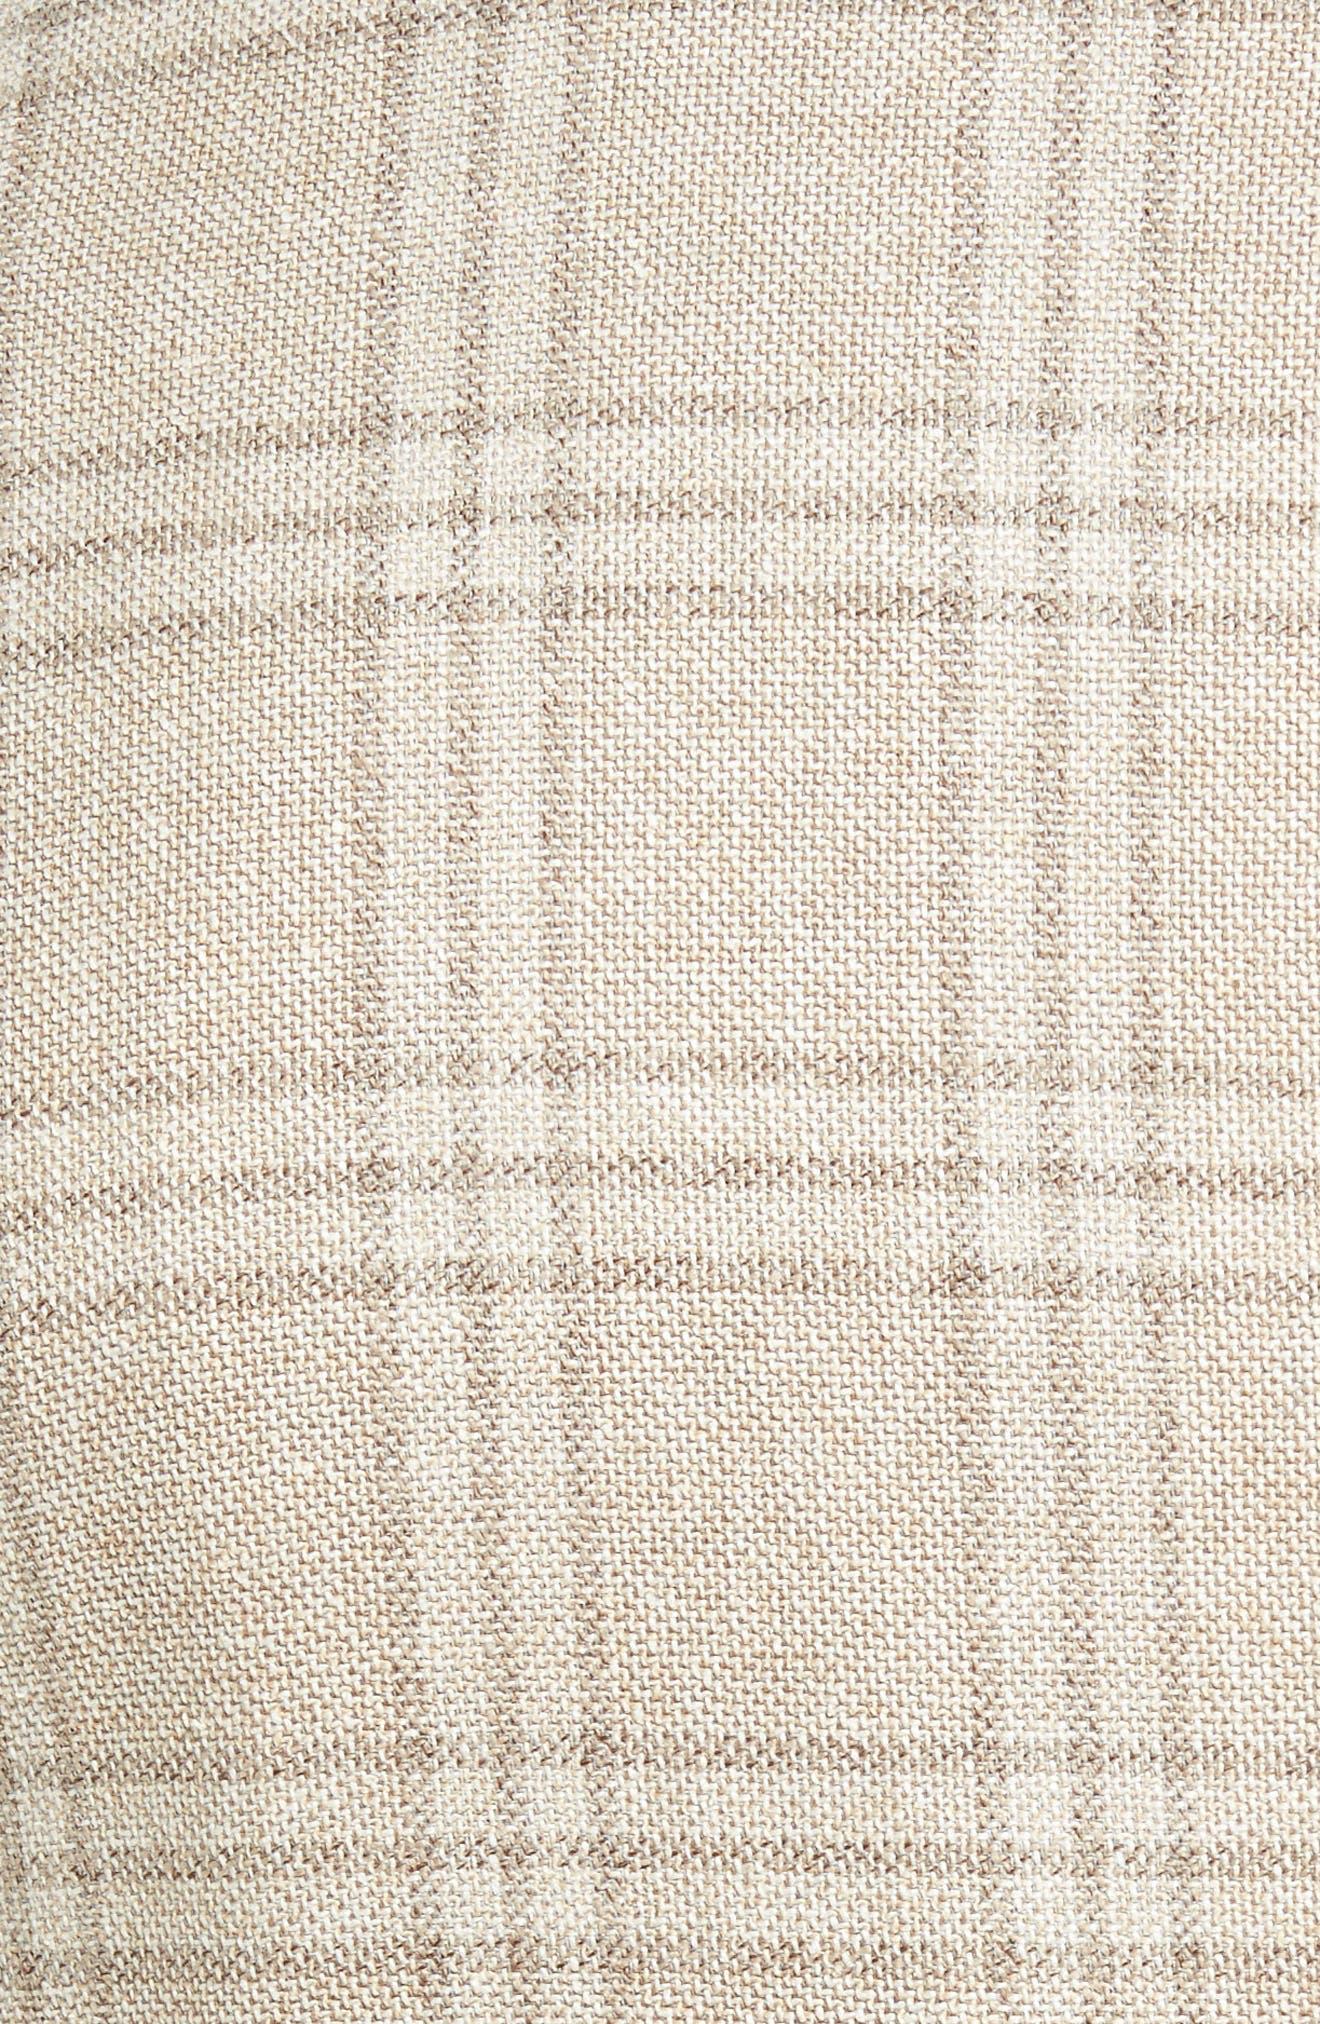 Plaid Wool Blend Sport Coat,                             Alternate thumbnail 6, color,                             252